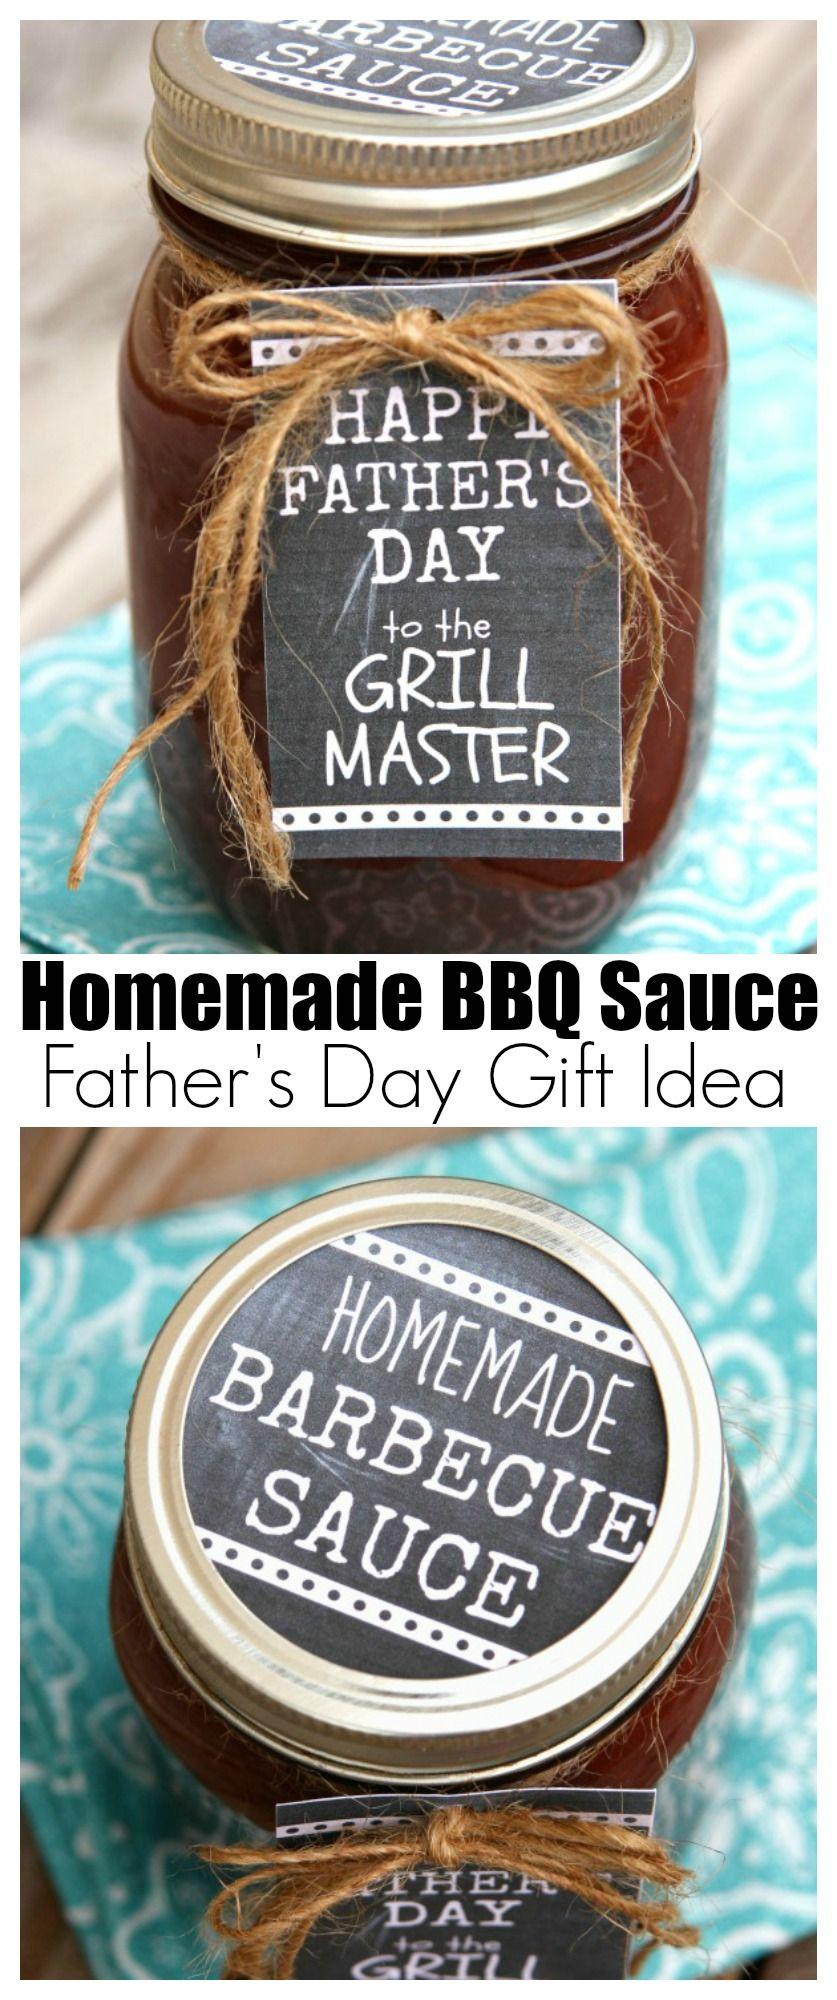 Homemade Old Bay Bbq Sauce